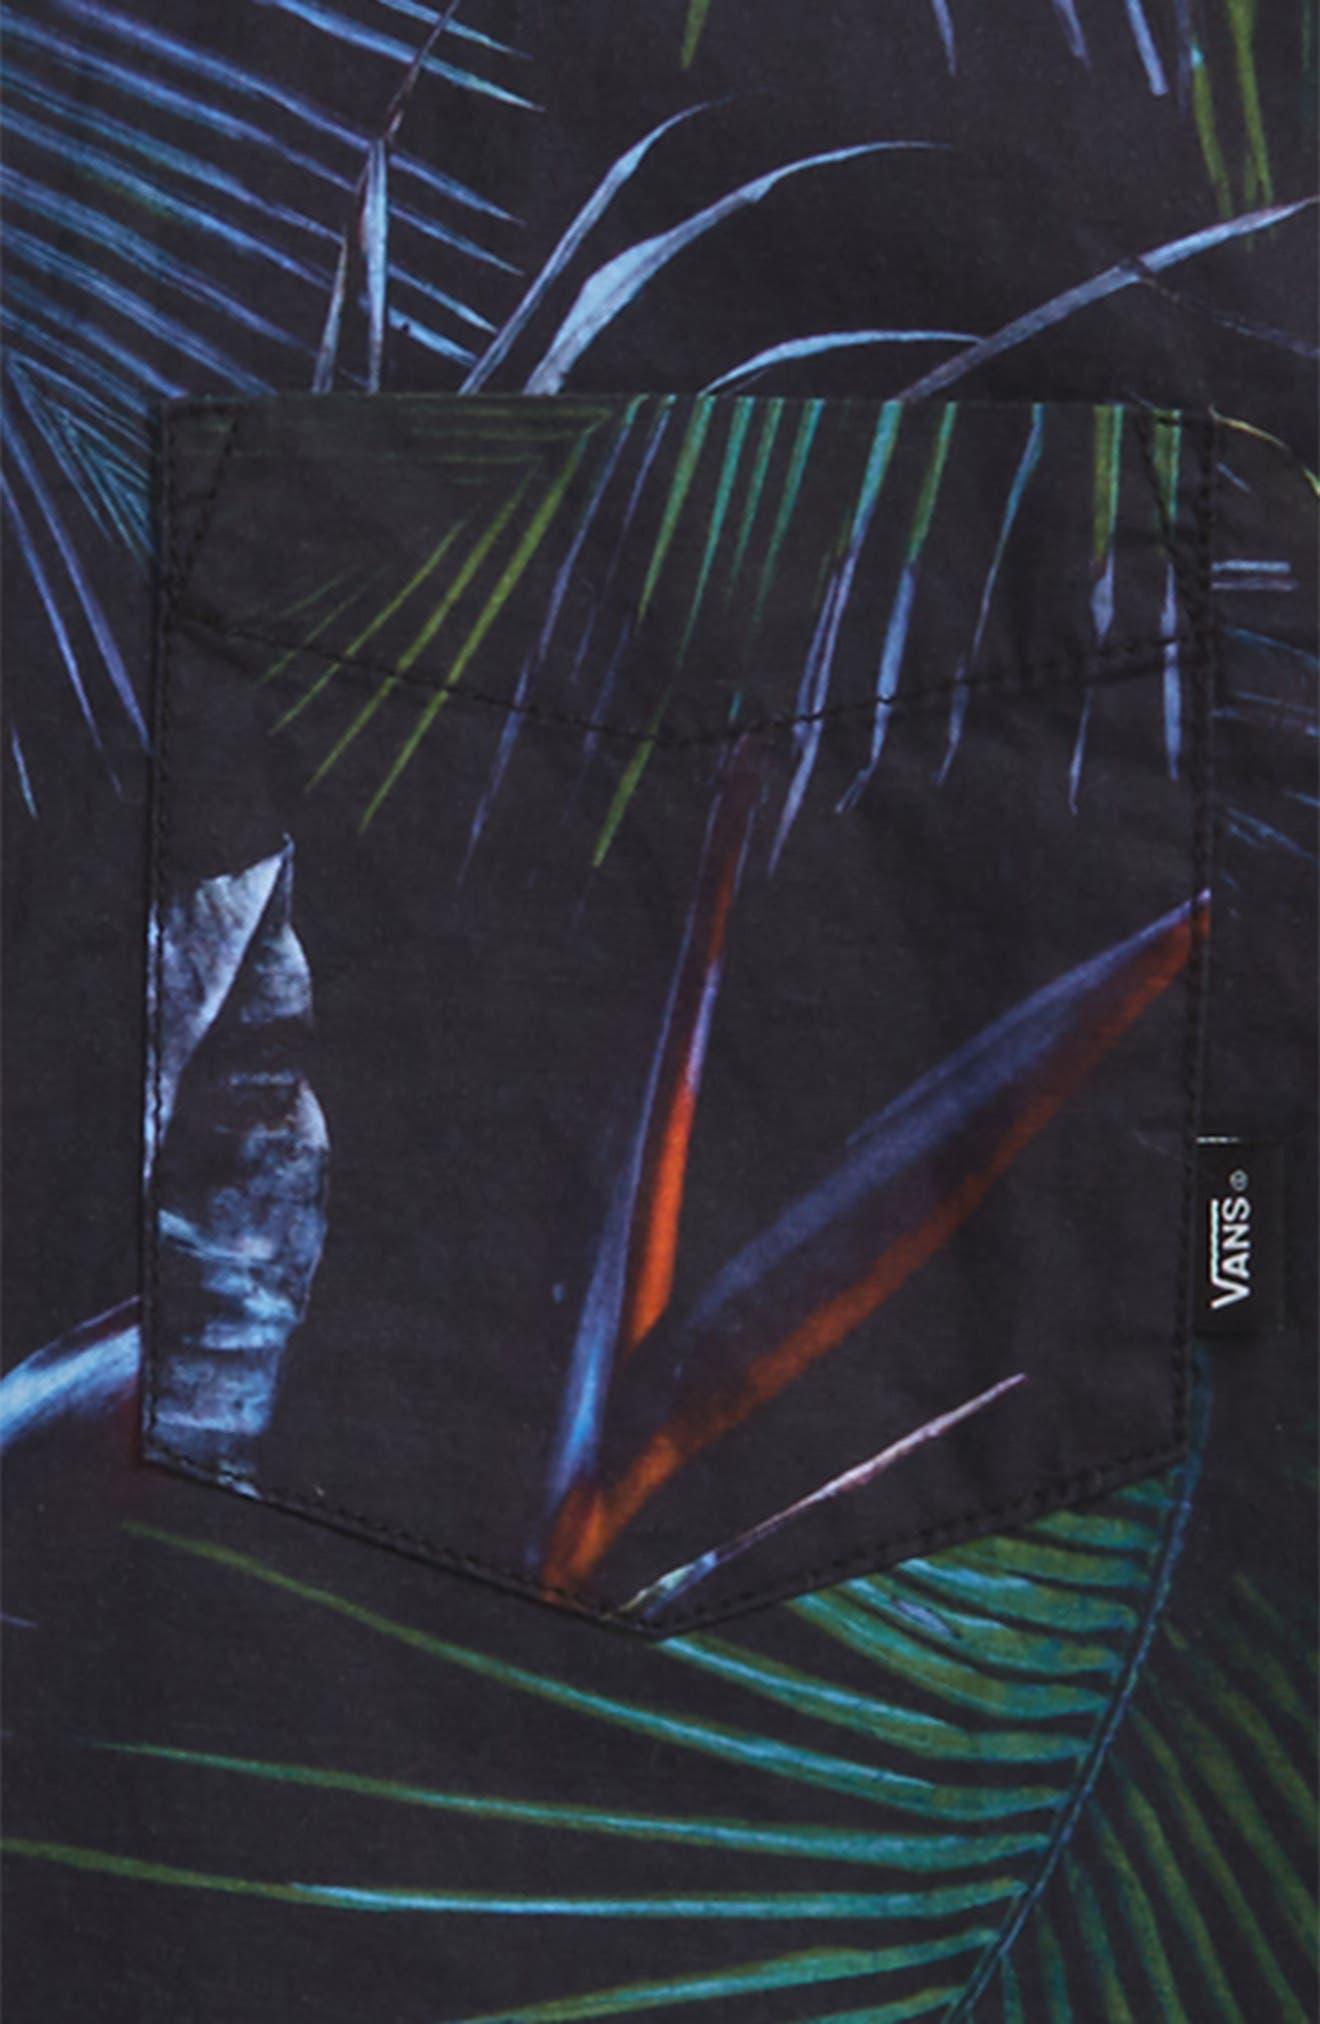 Neo Jungle Short Sleeve Woven Shirt,                             Alternate thumbnail 2, color,                             Neo Jungle